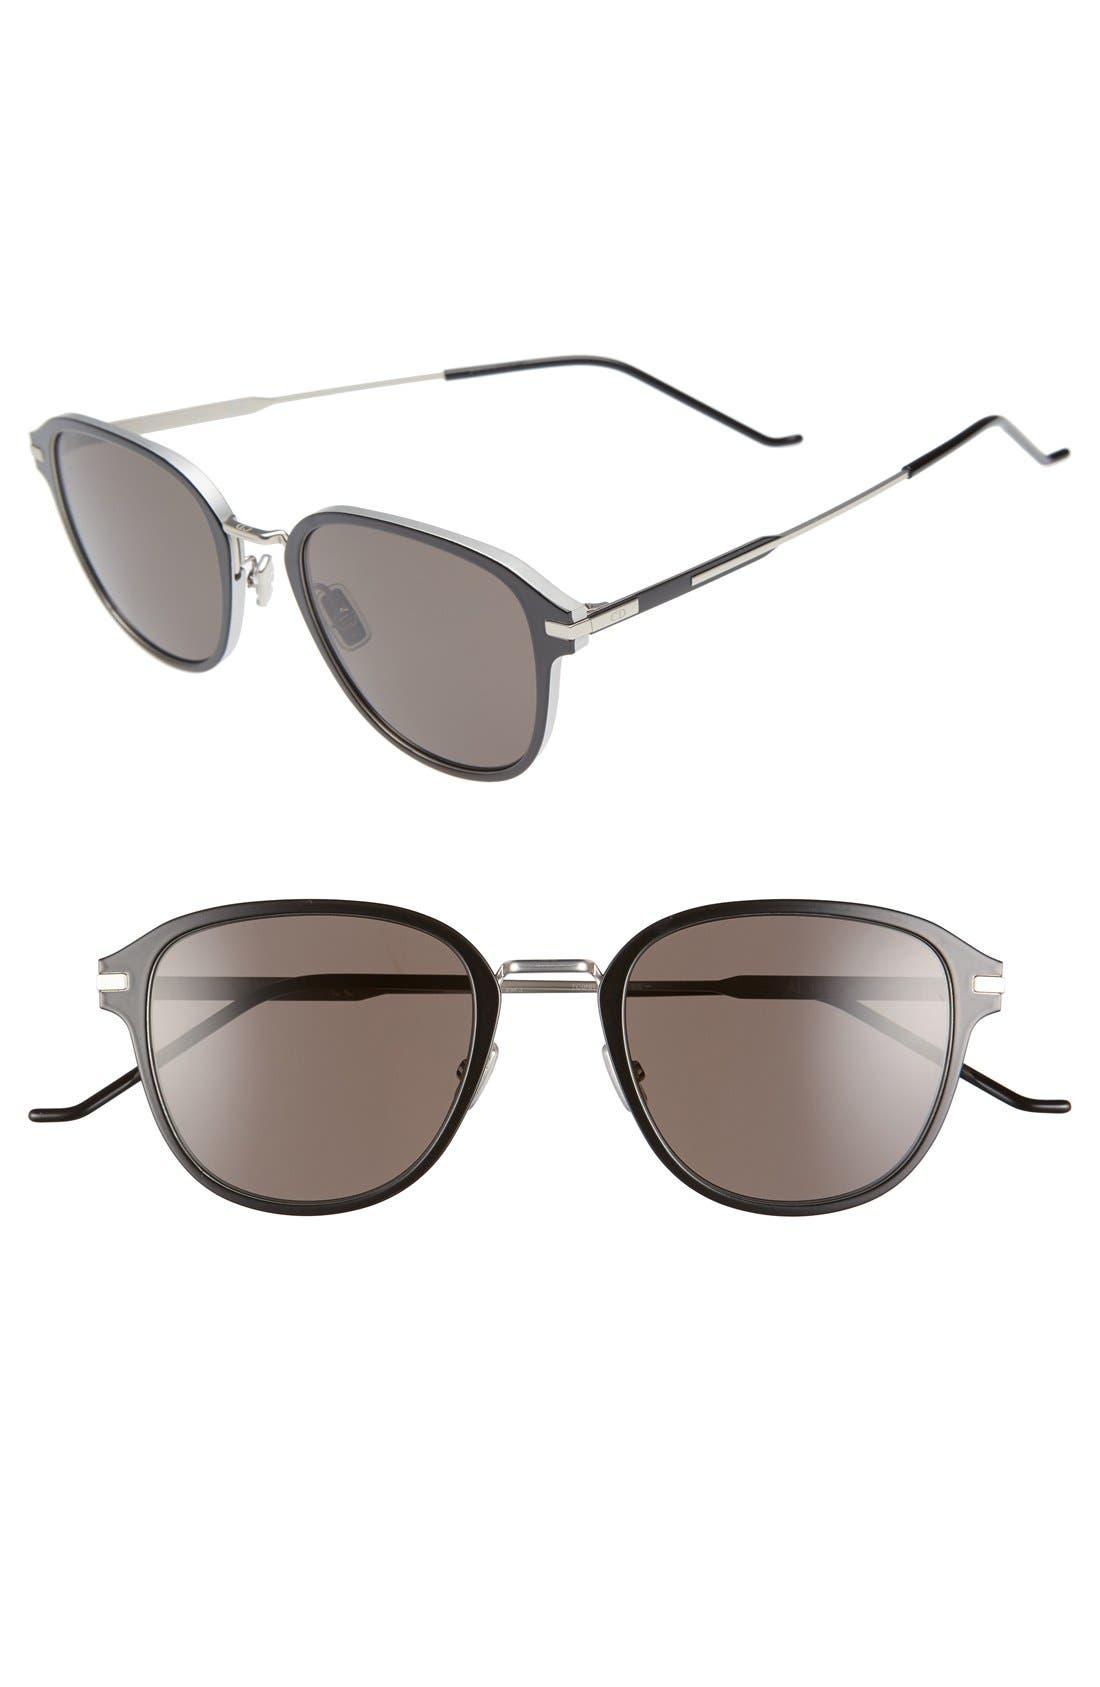 55mm Wire Sunglasses,                             Main thumbnail 1, color,                             METALLIC SILVER/ BLACK